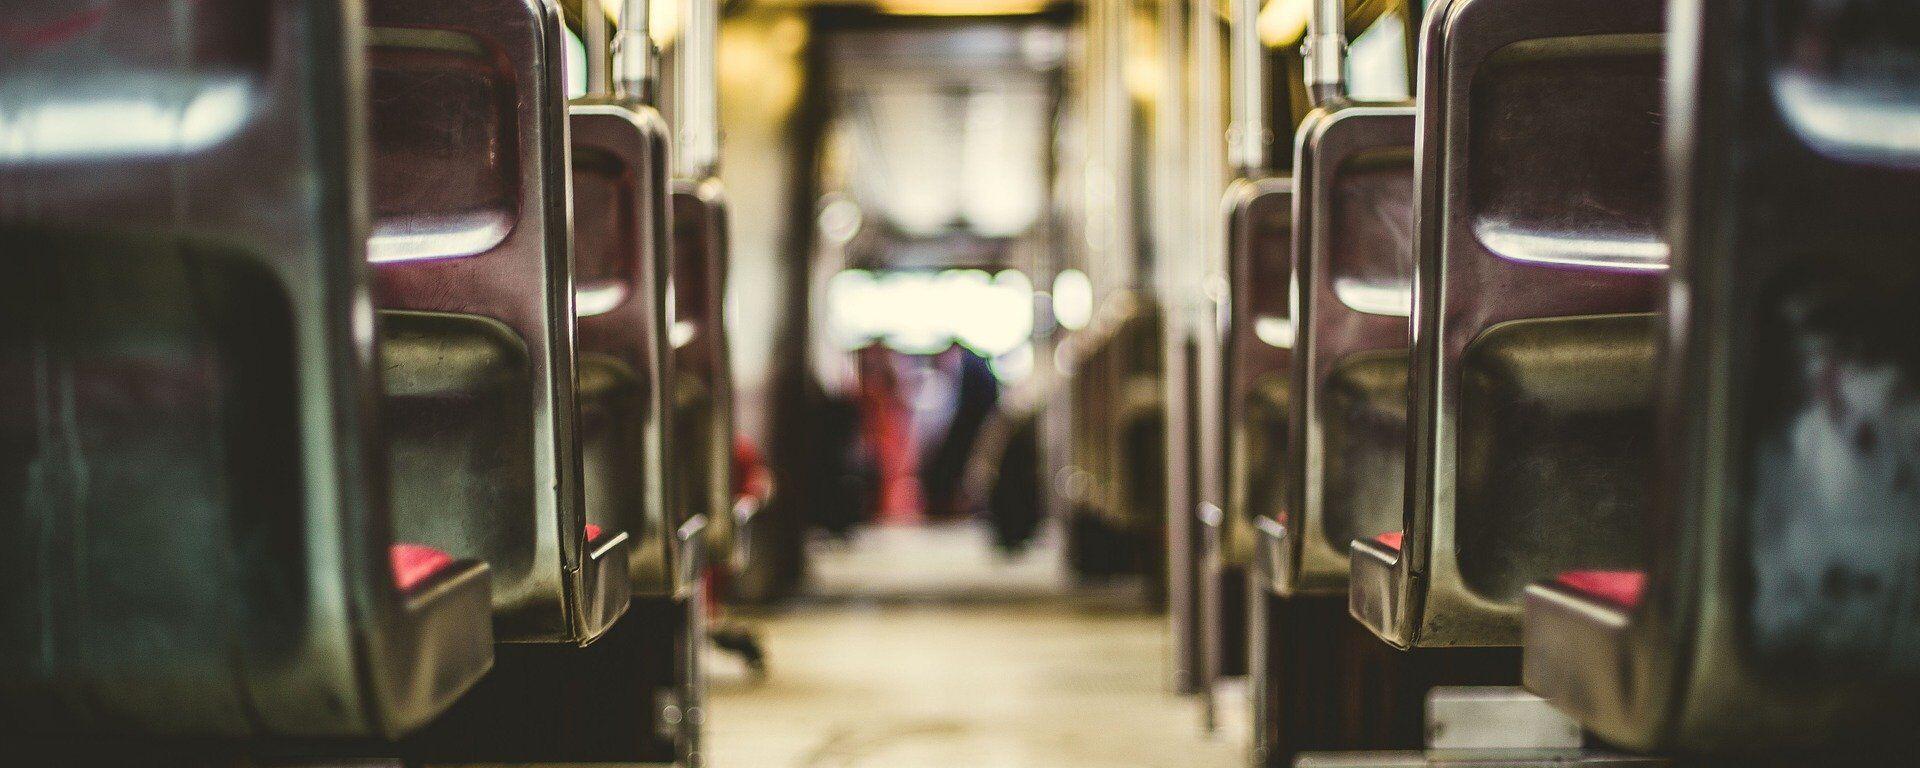 Dentro de un autobús (imagen referencial) - Sputnik Mundo, 1920, 21.04.2021